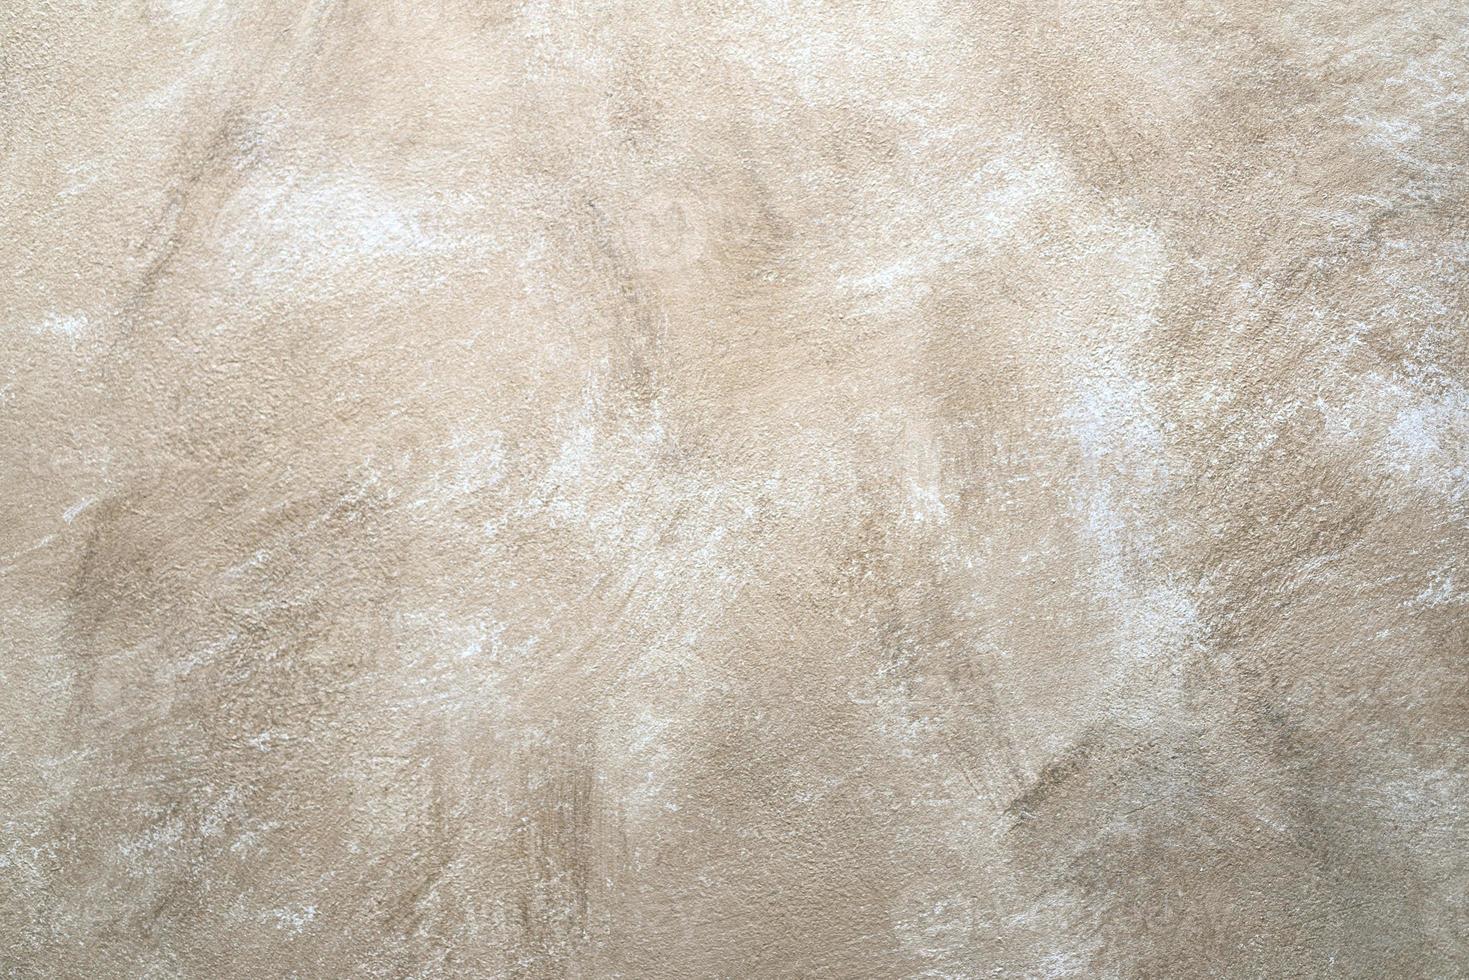 rock abstracte beige muur achtergrond foto